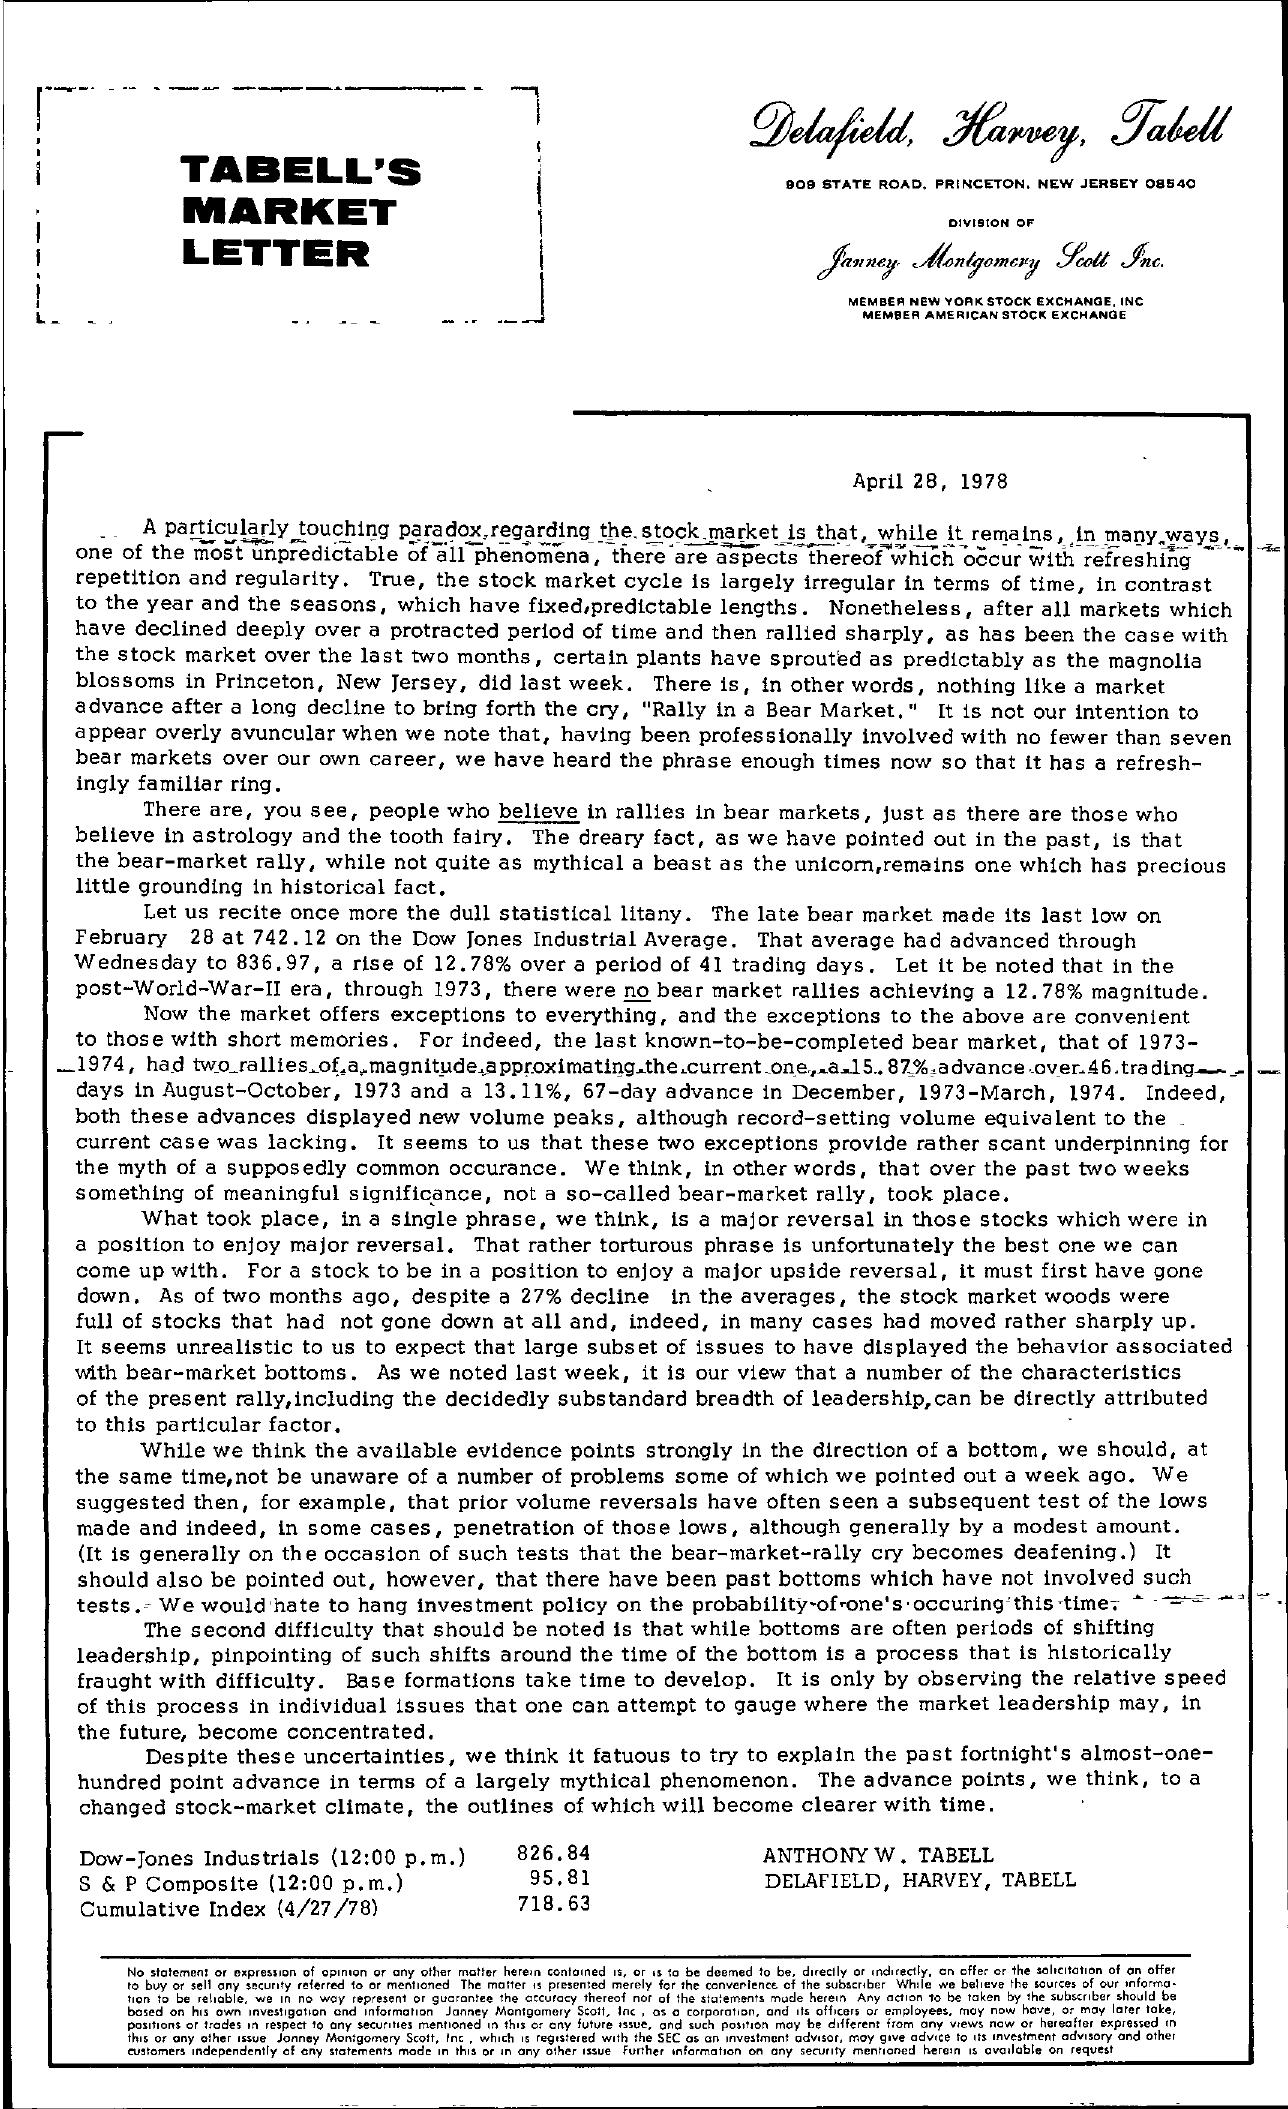 Tabell's Market Letter - April 28, 1978